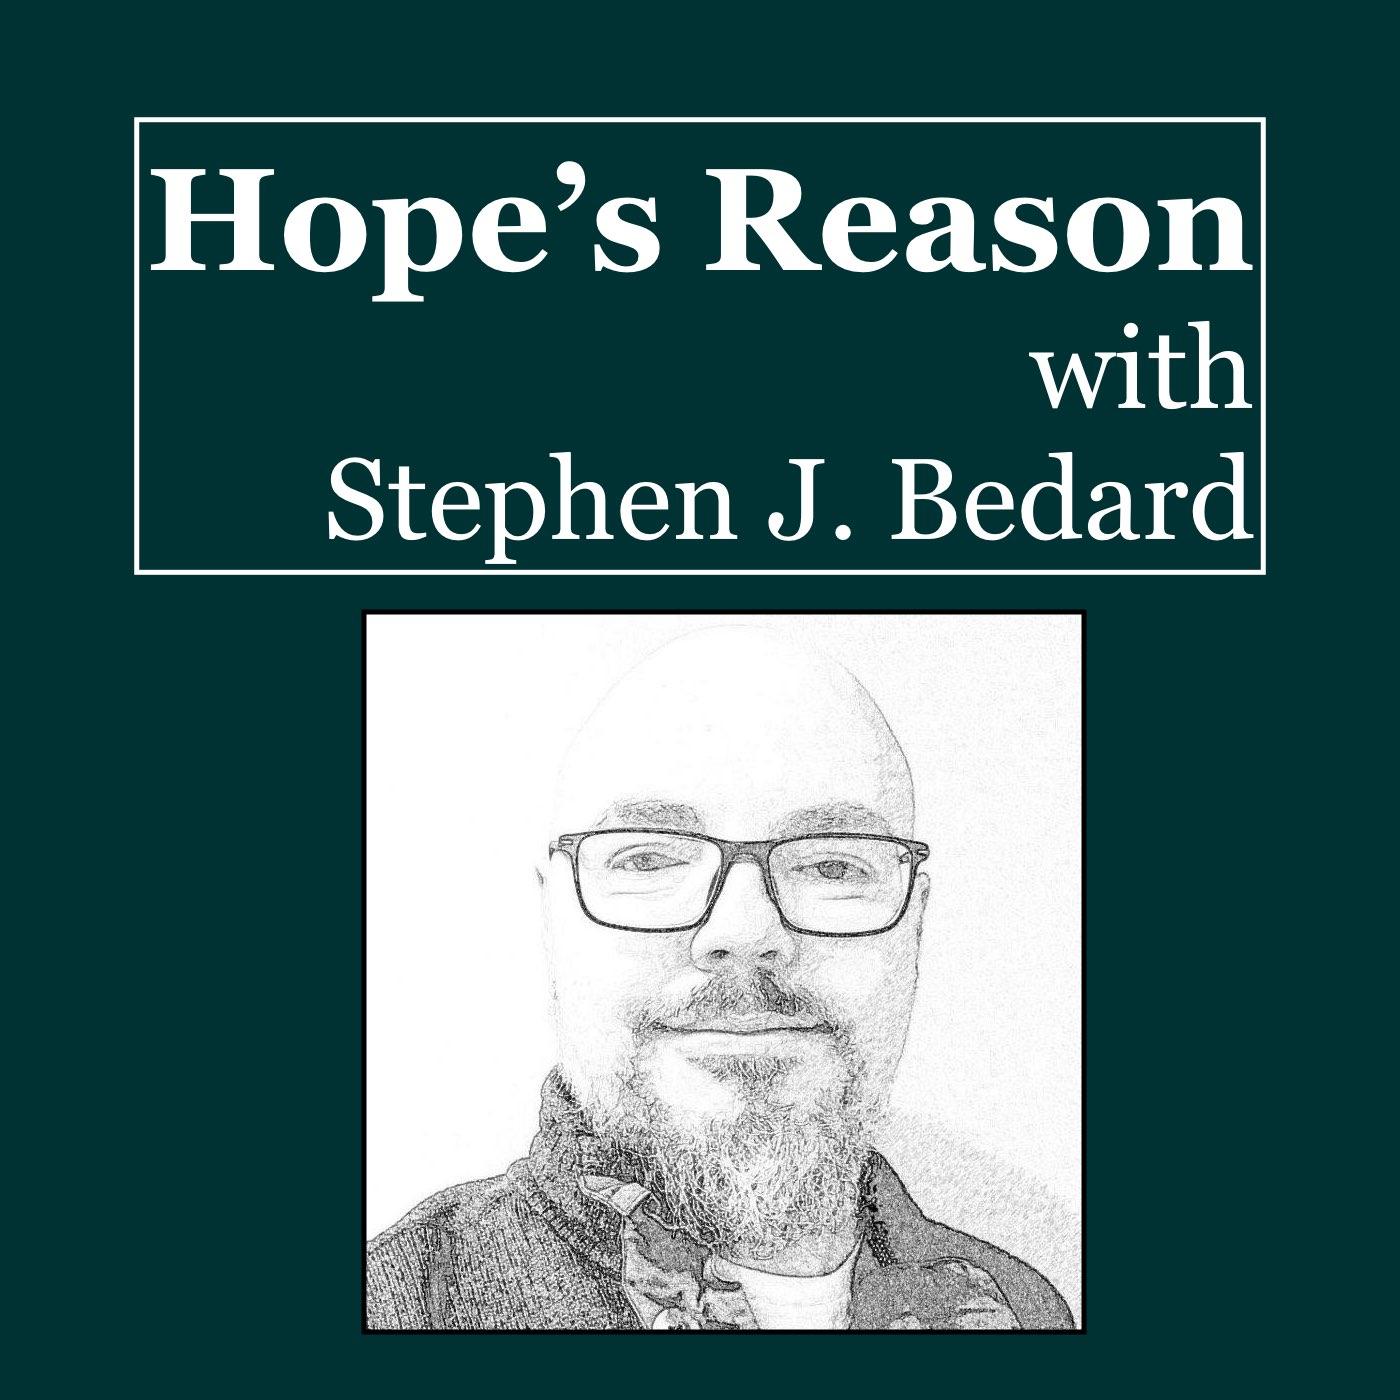 Hope's Reason